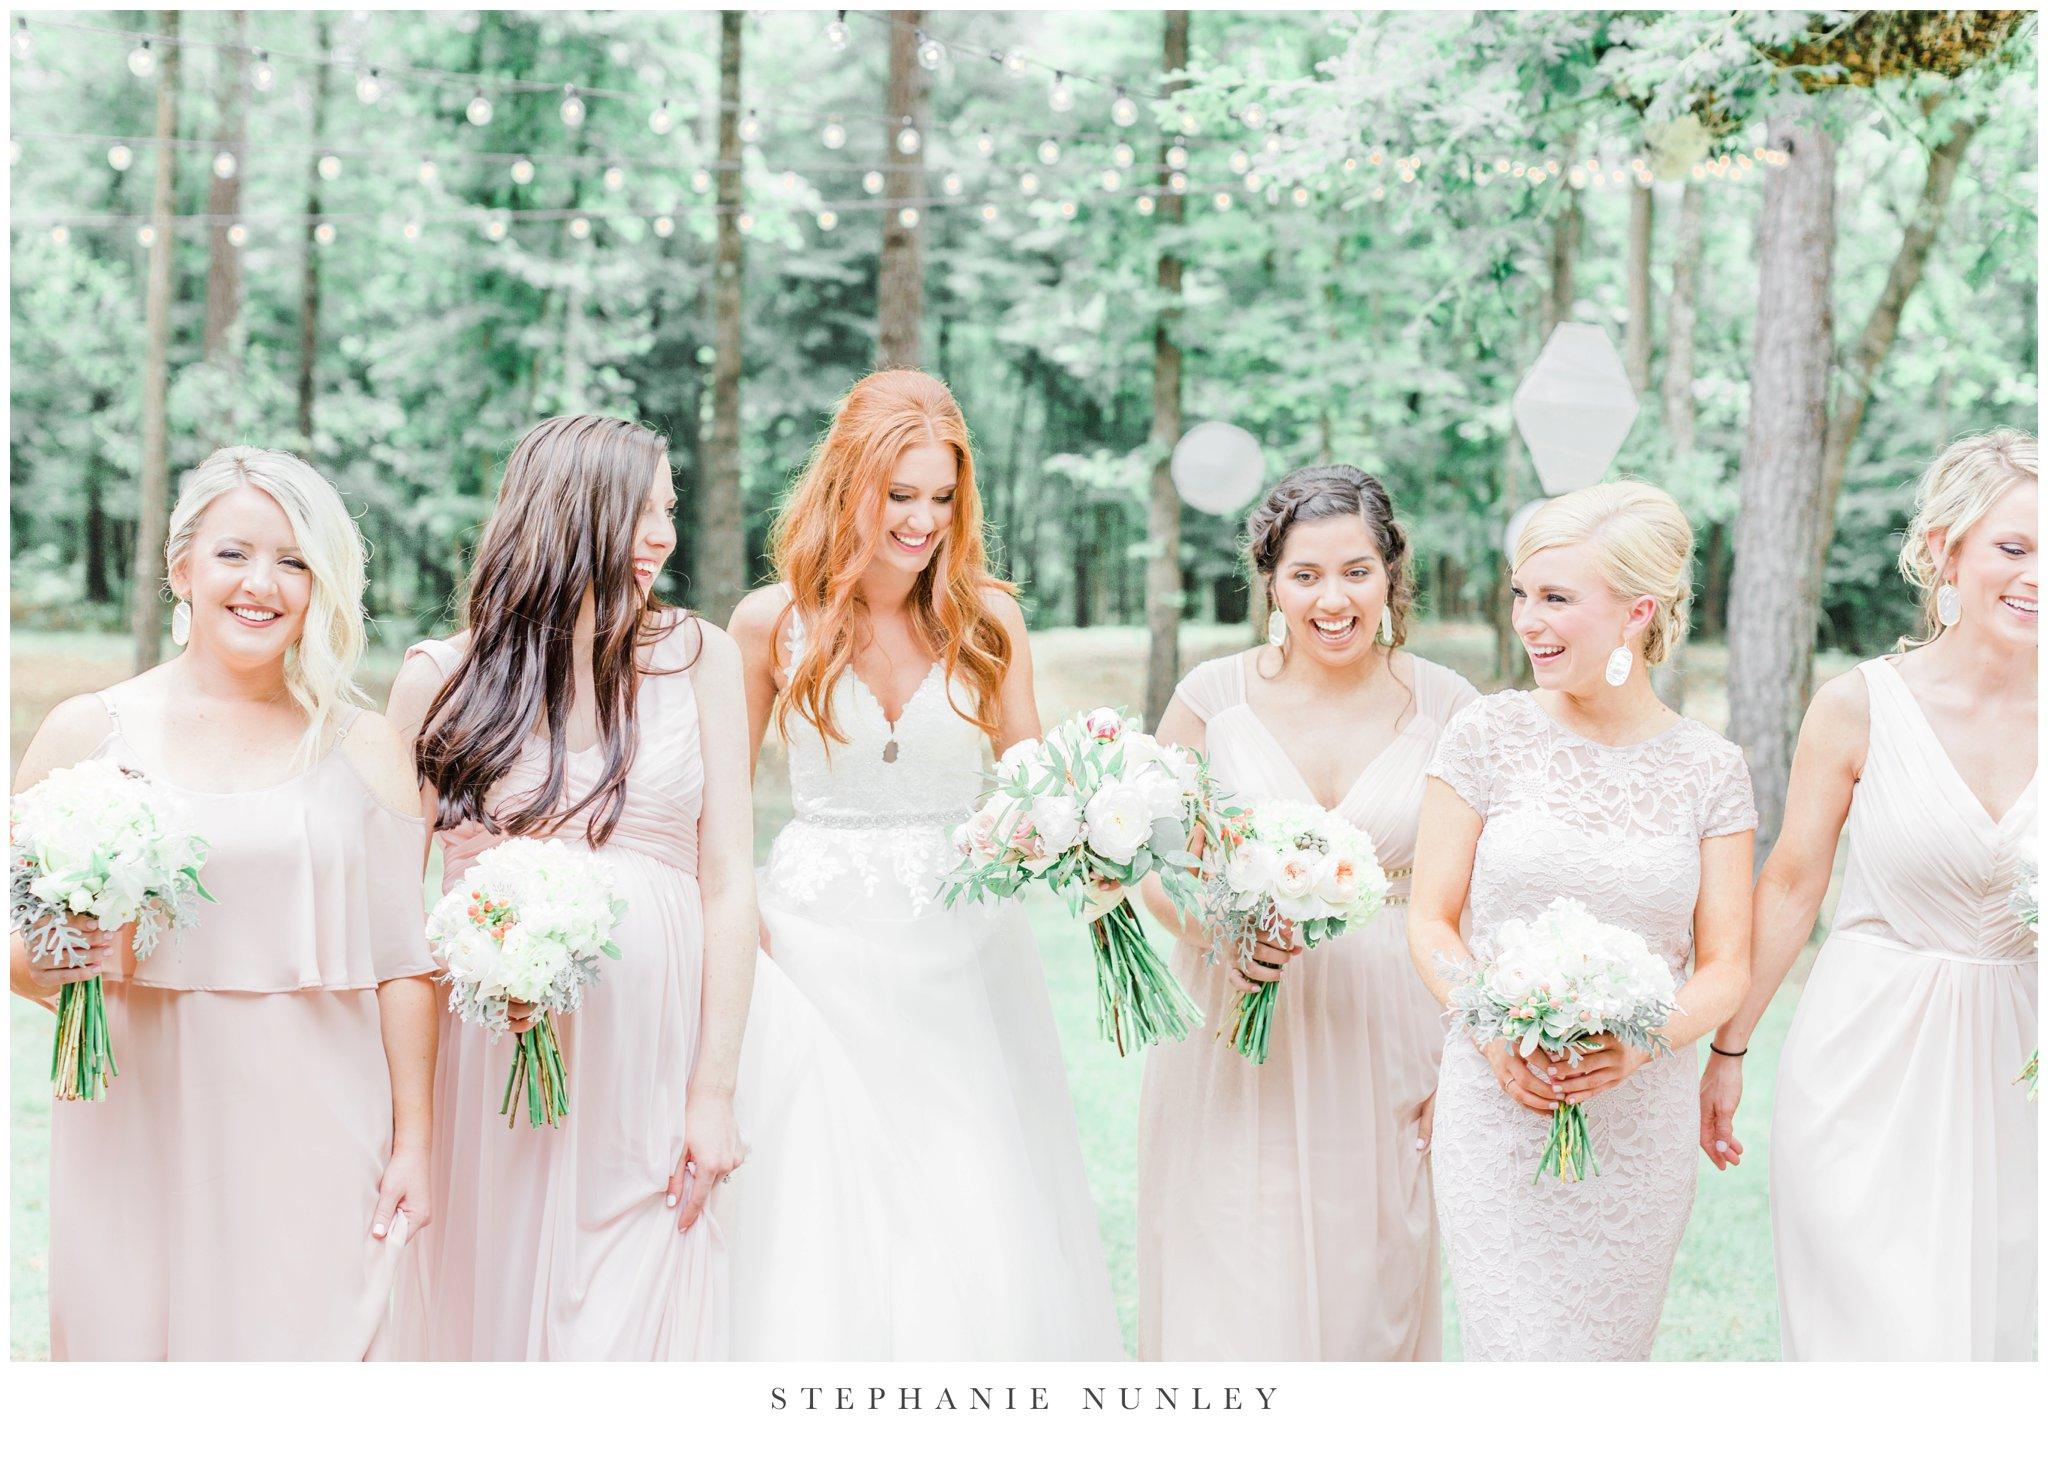 blessing-tree-farm-arkansas-wedding-0058.jpg